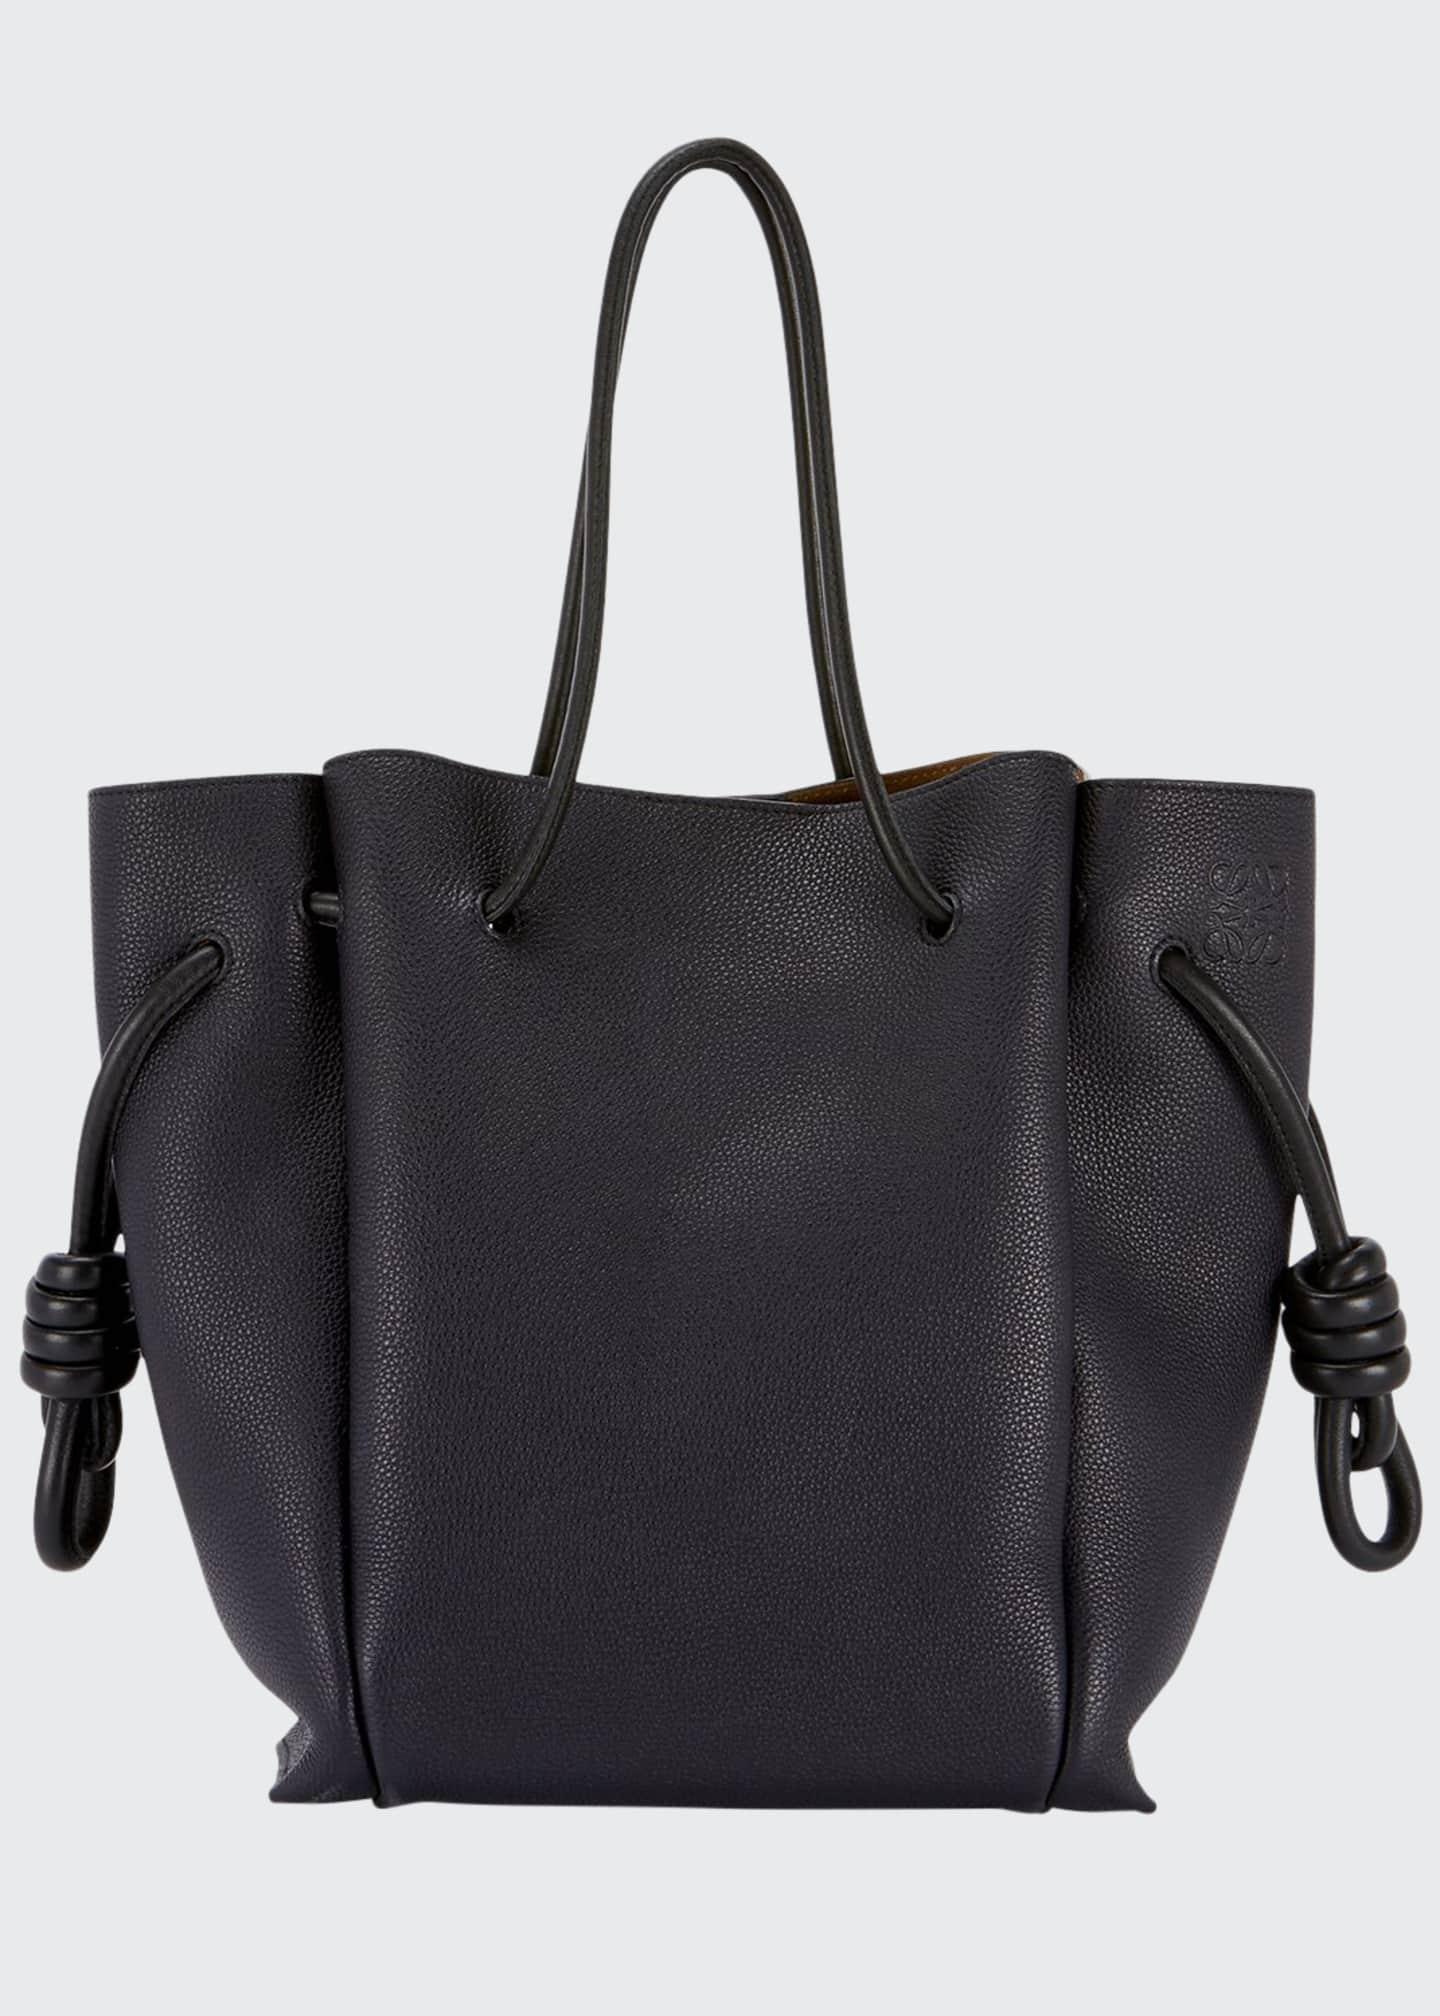 Loewe Flamenco Knot Leather Tote Bag